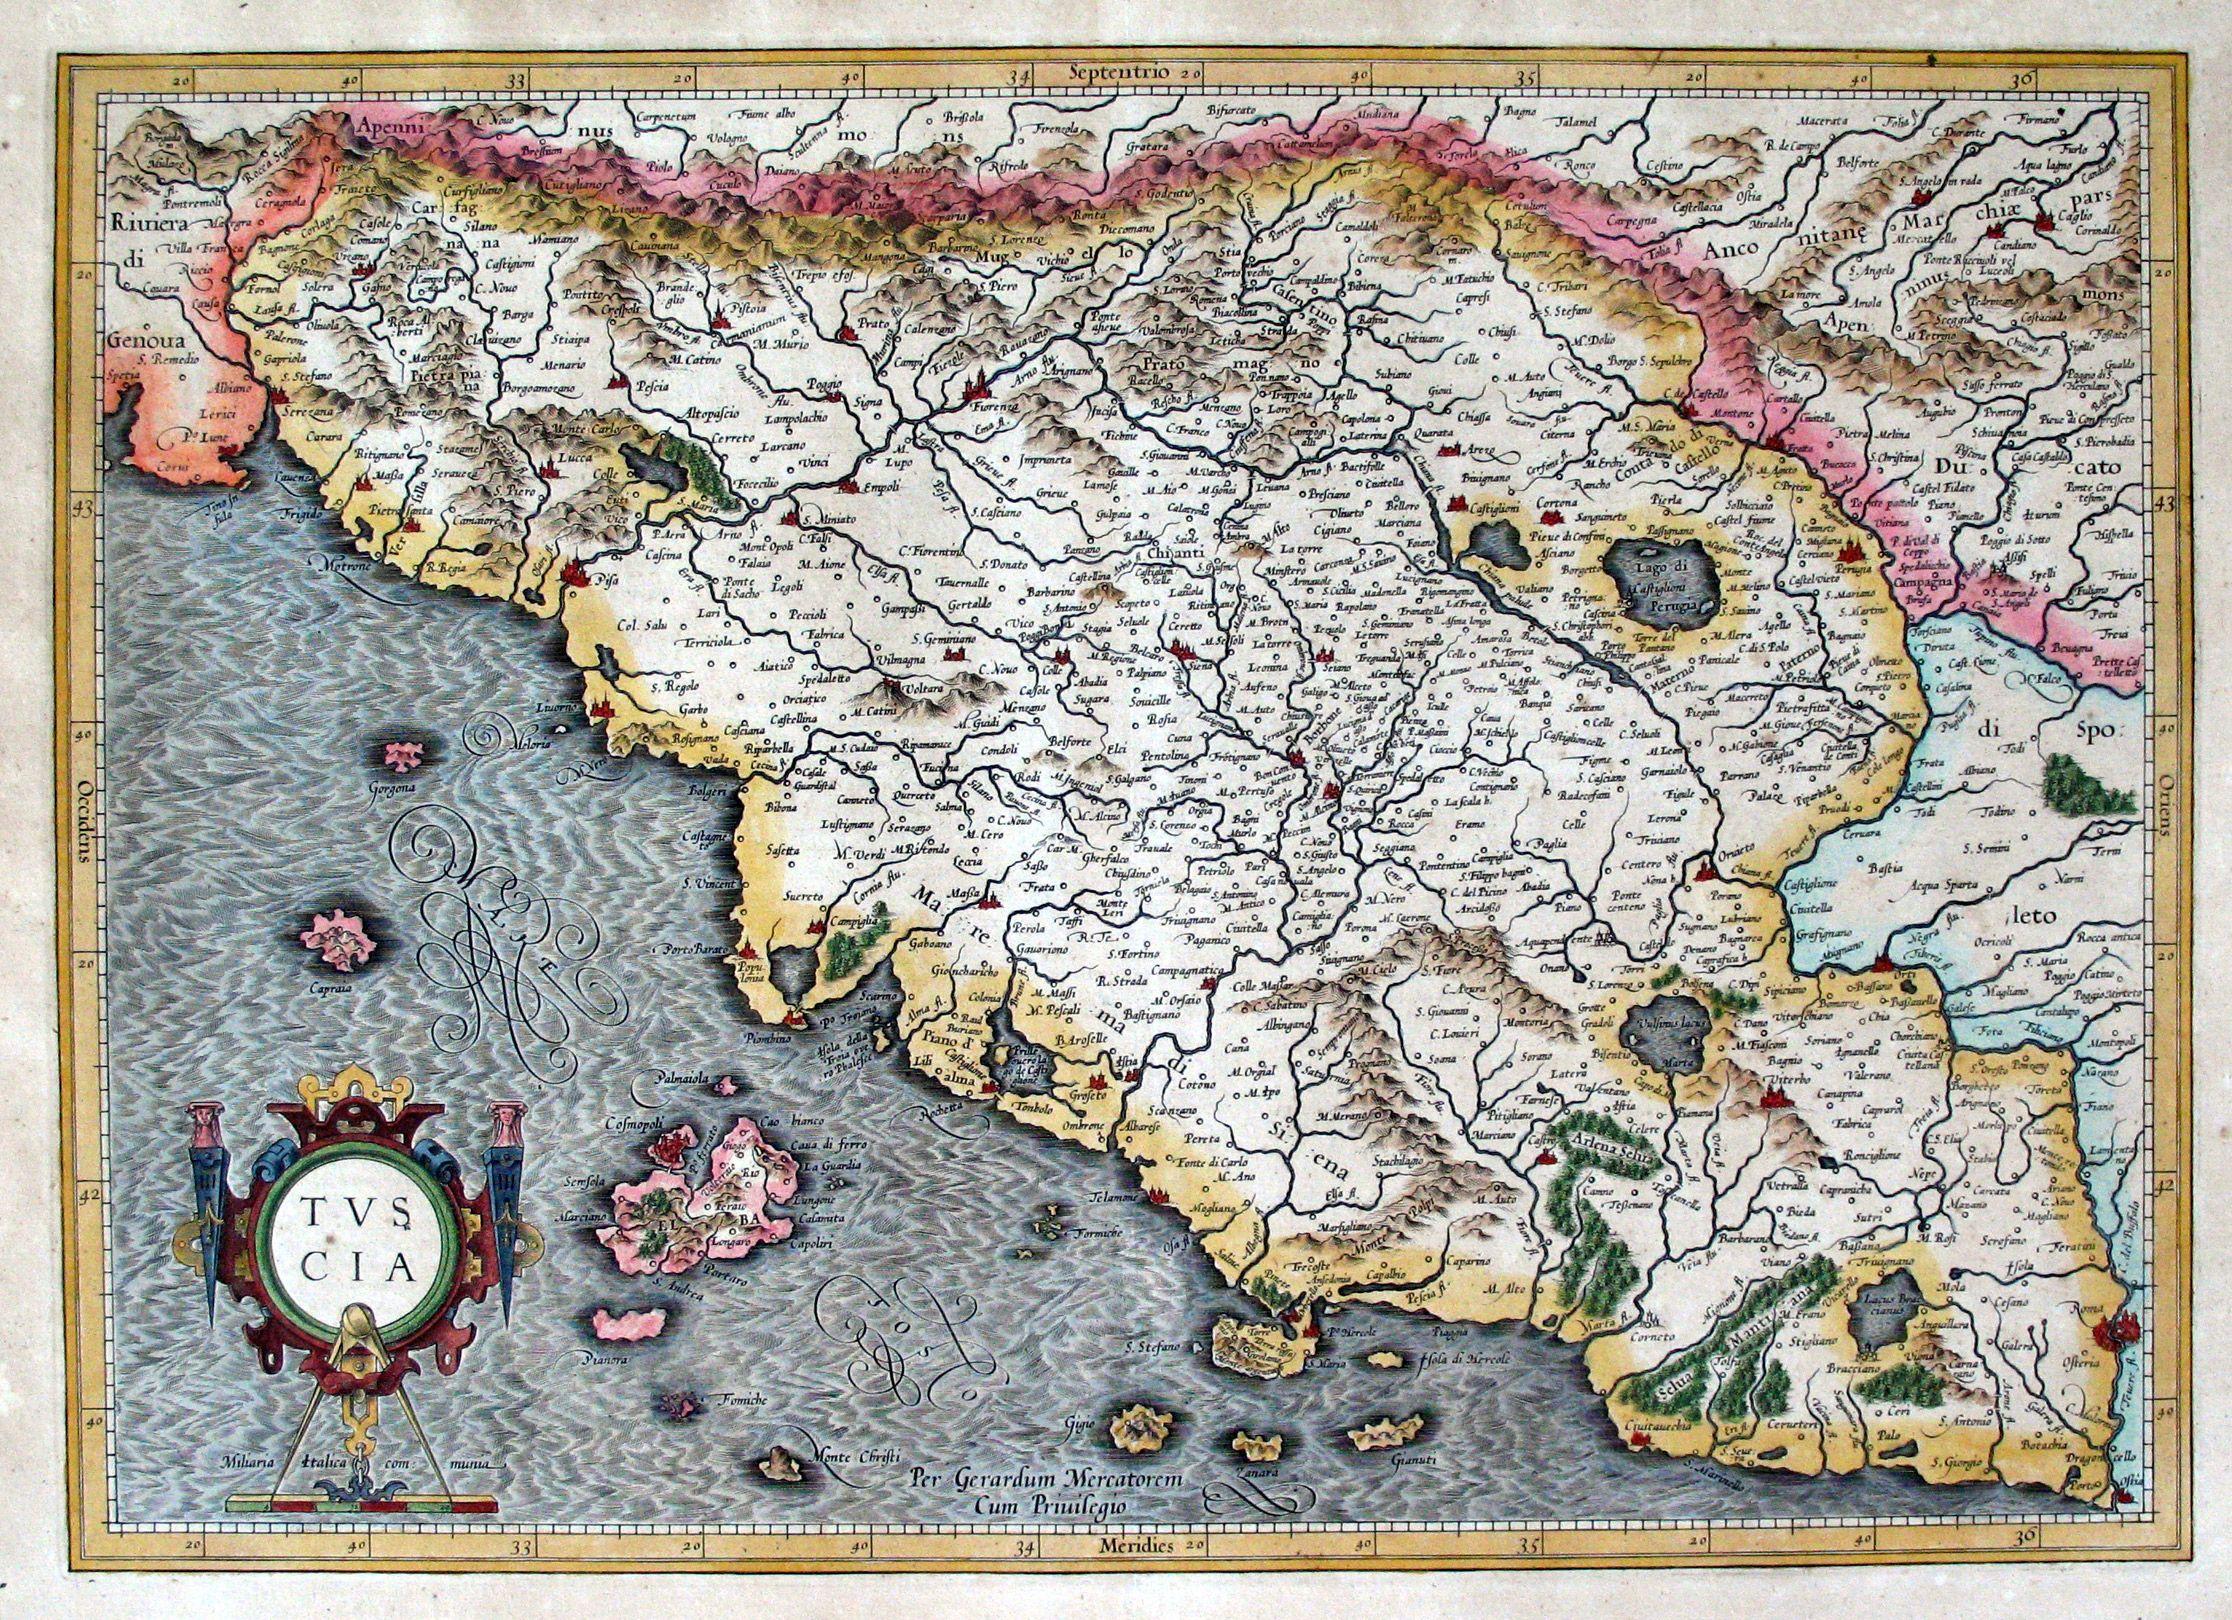 E 453 Jpg Jpeg Image 2232x1620 Pixels Tuscany Map Vintage Map Map